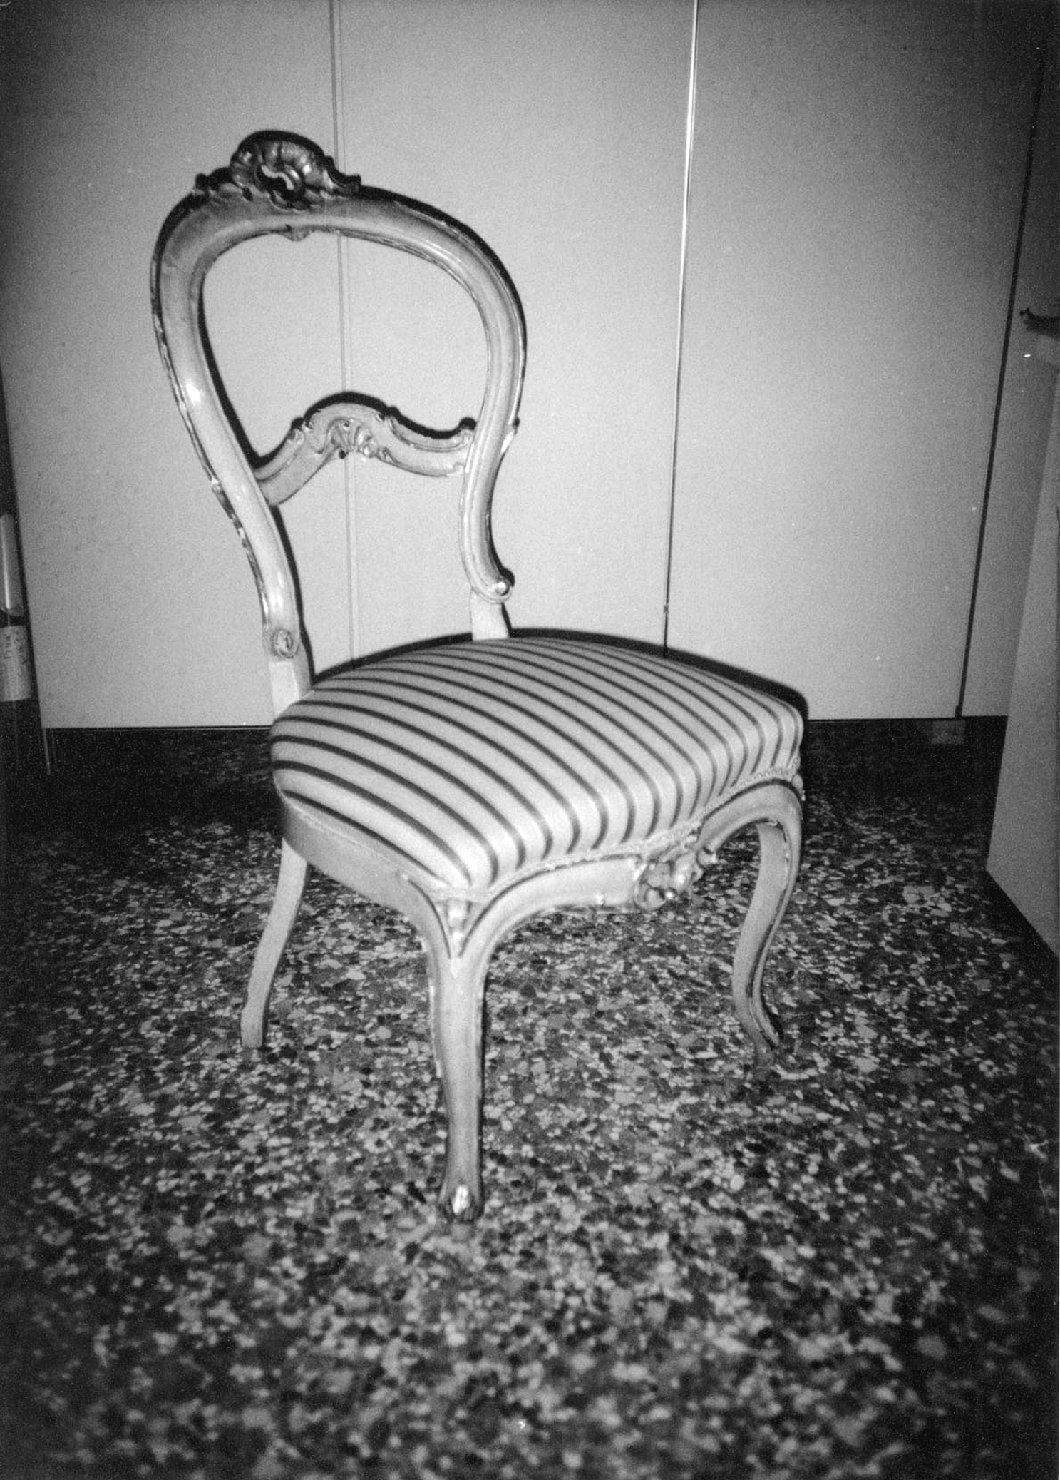 sedia, opera isolata - manifattura veneziana (sec. XIX)